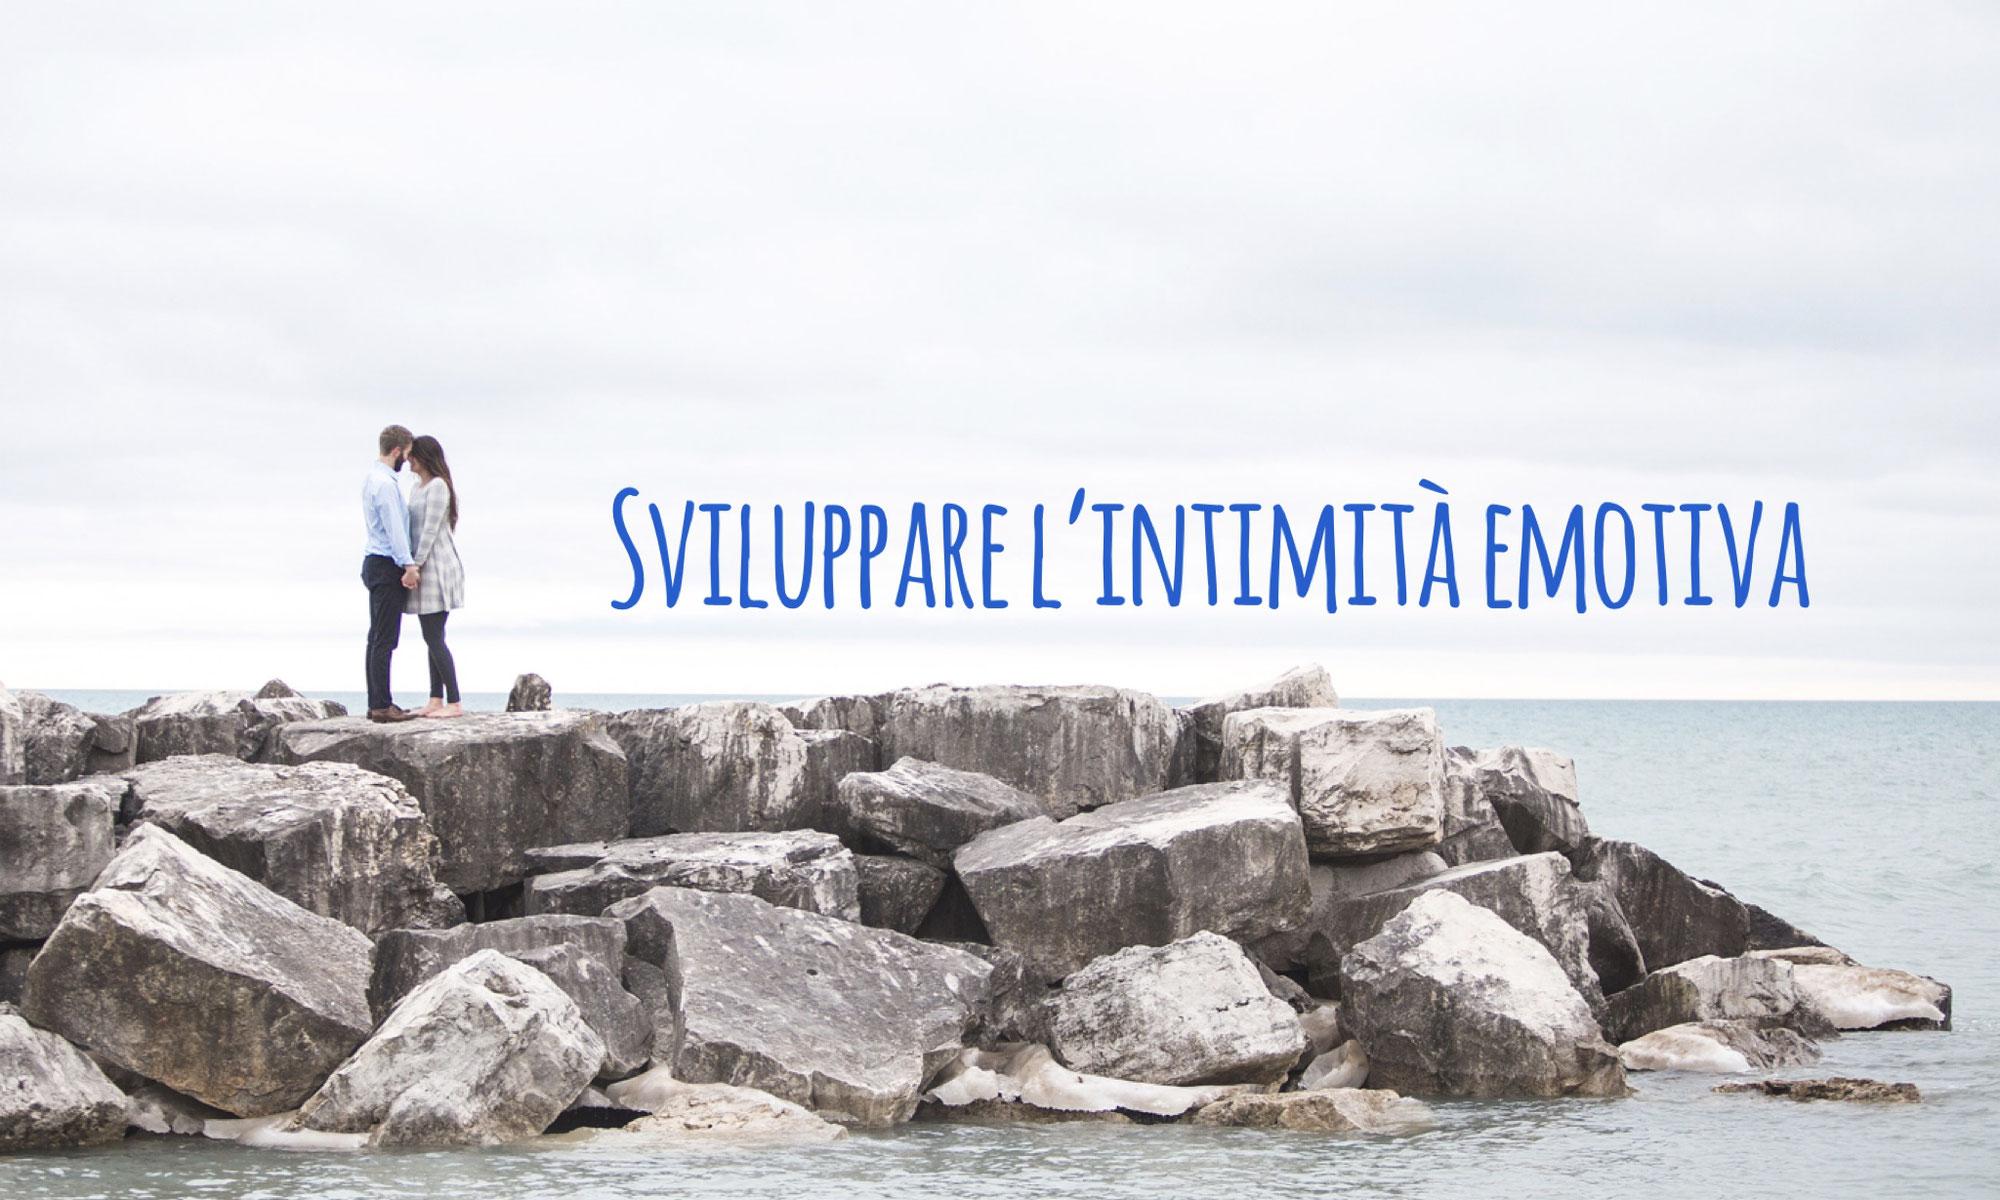 Sviluppare l'intimità emotiva